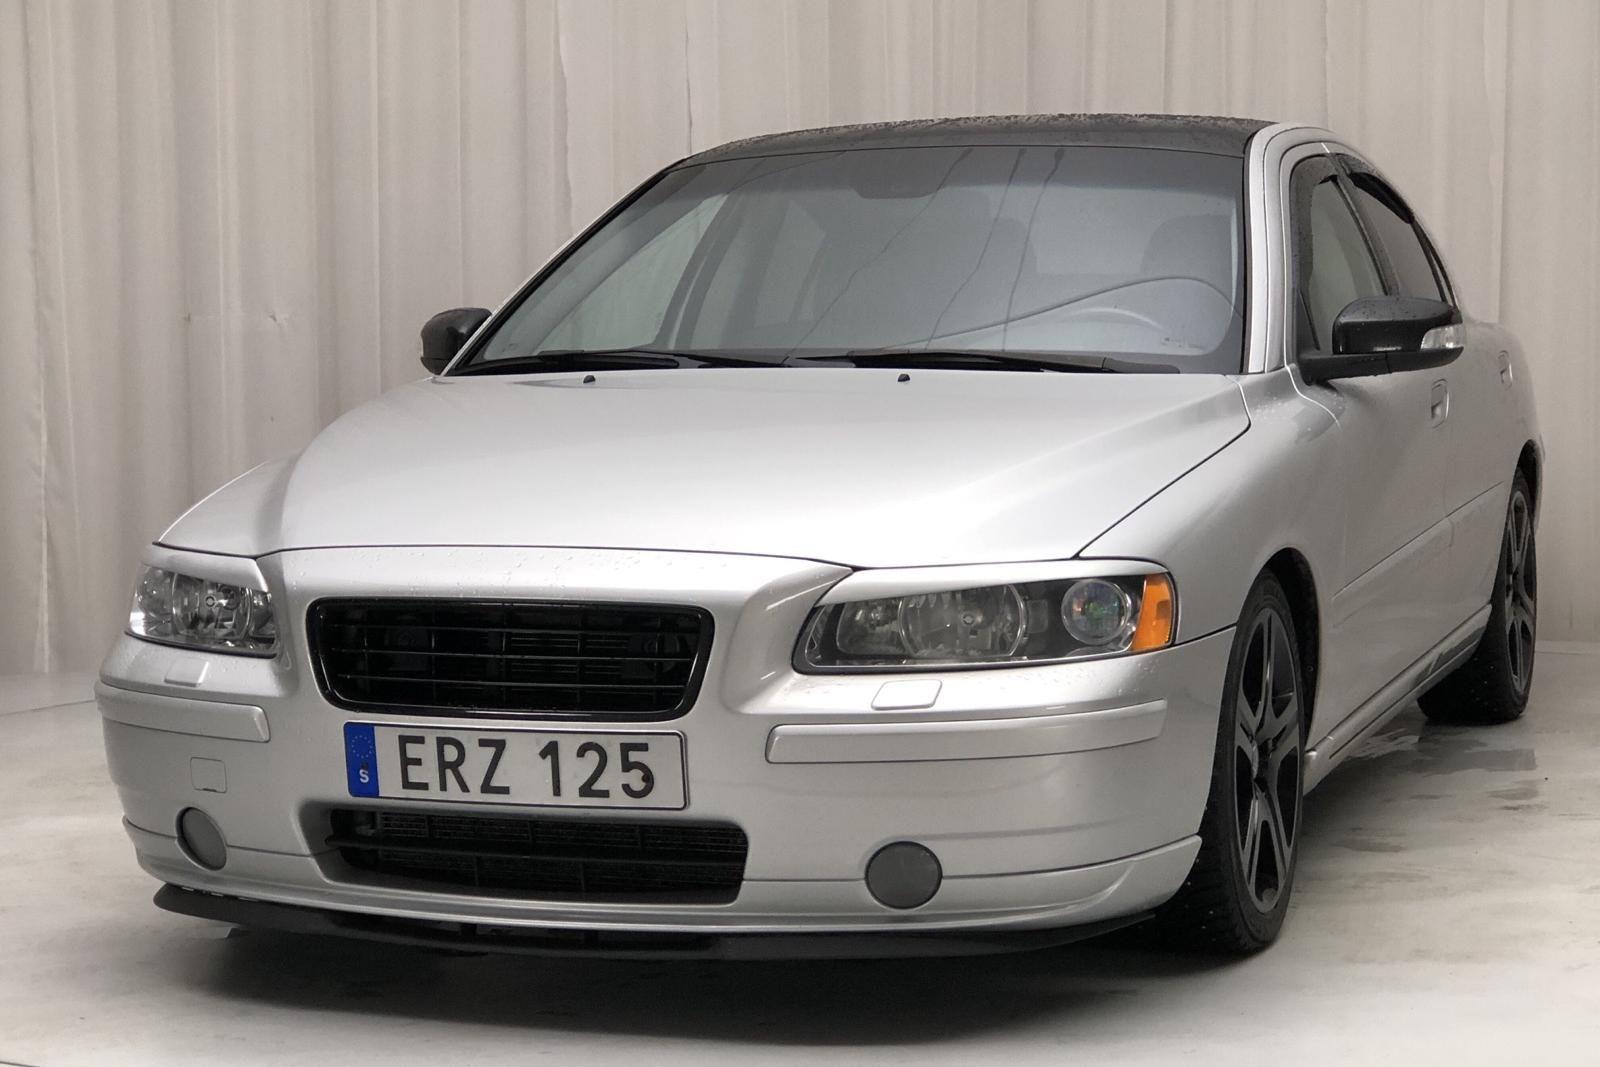 Volvo S60 D5 (185 PS)